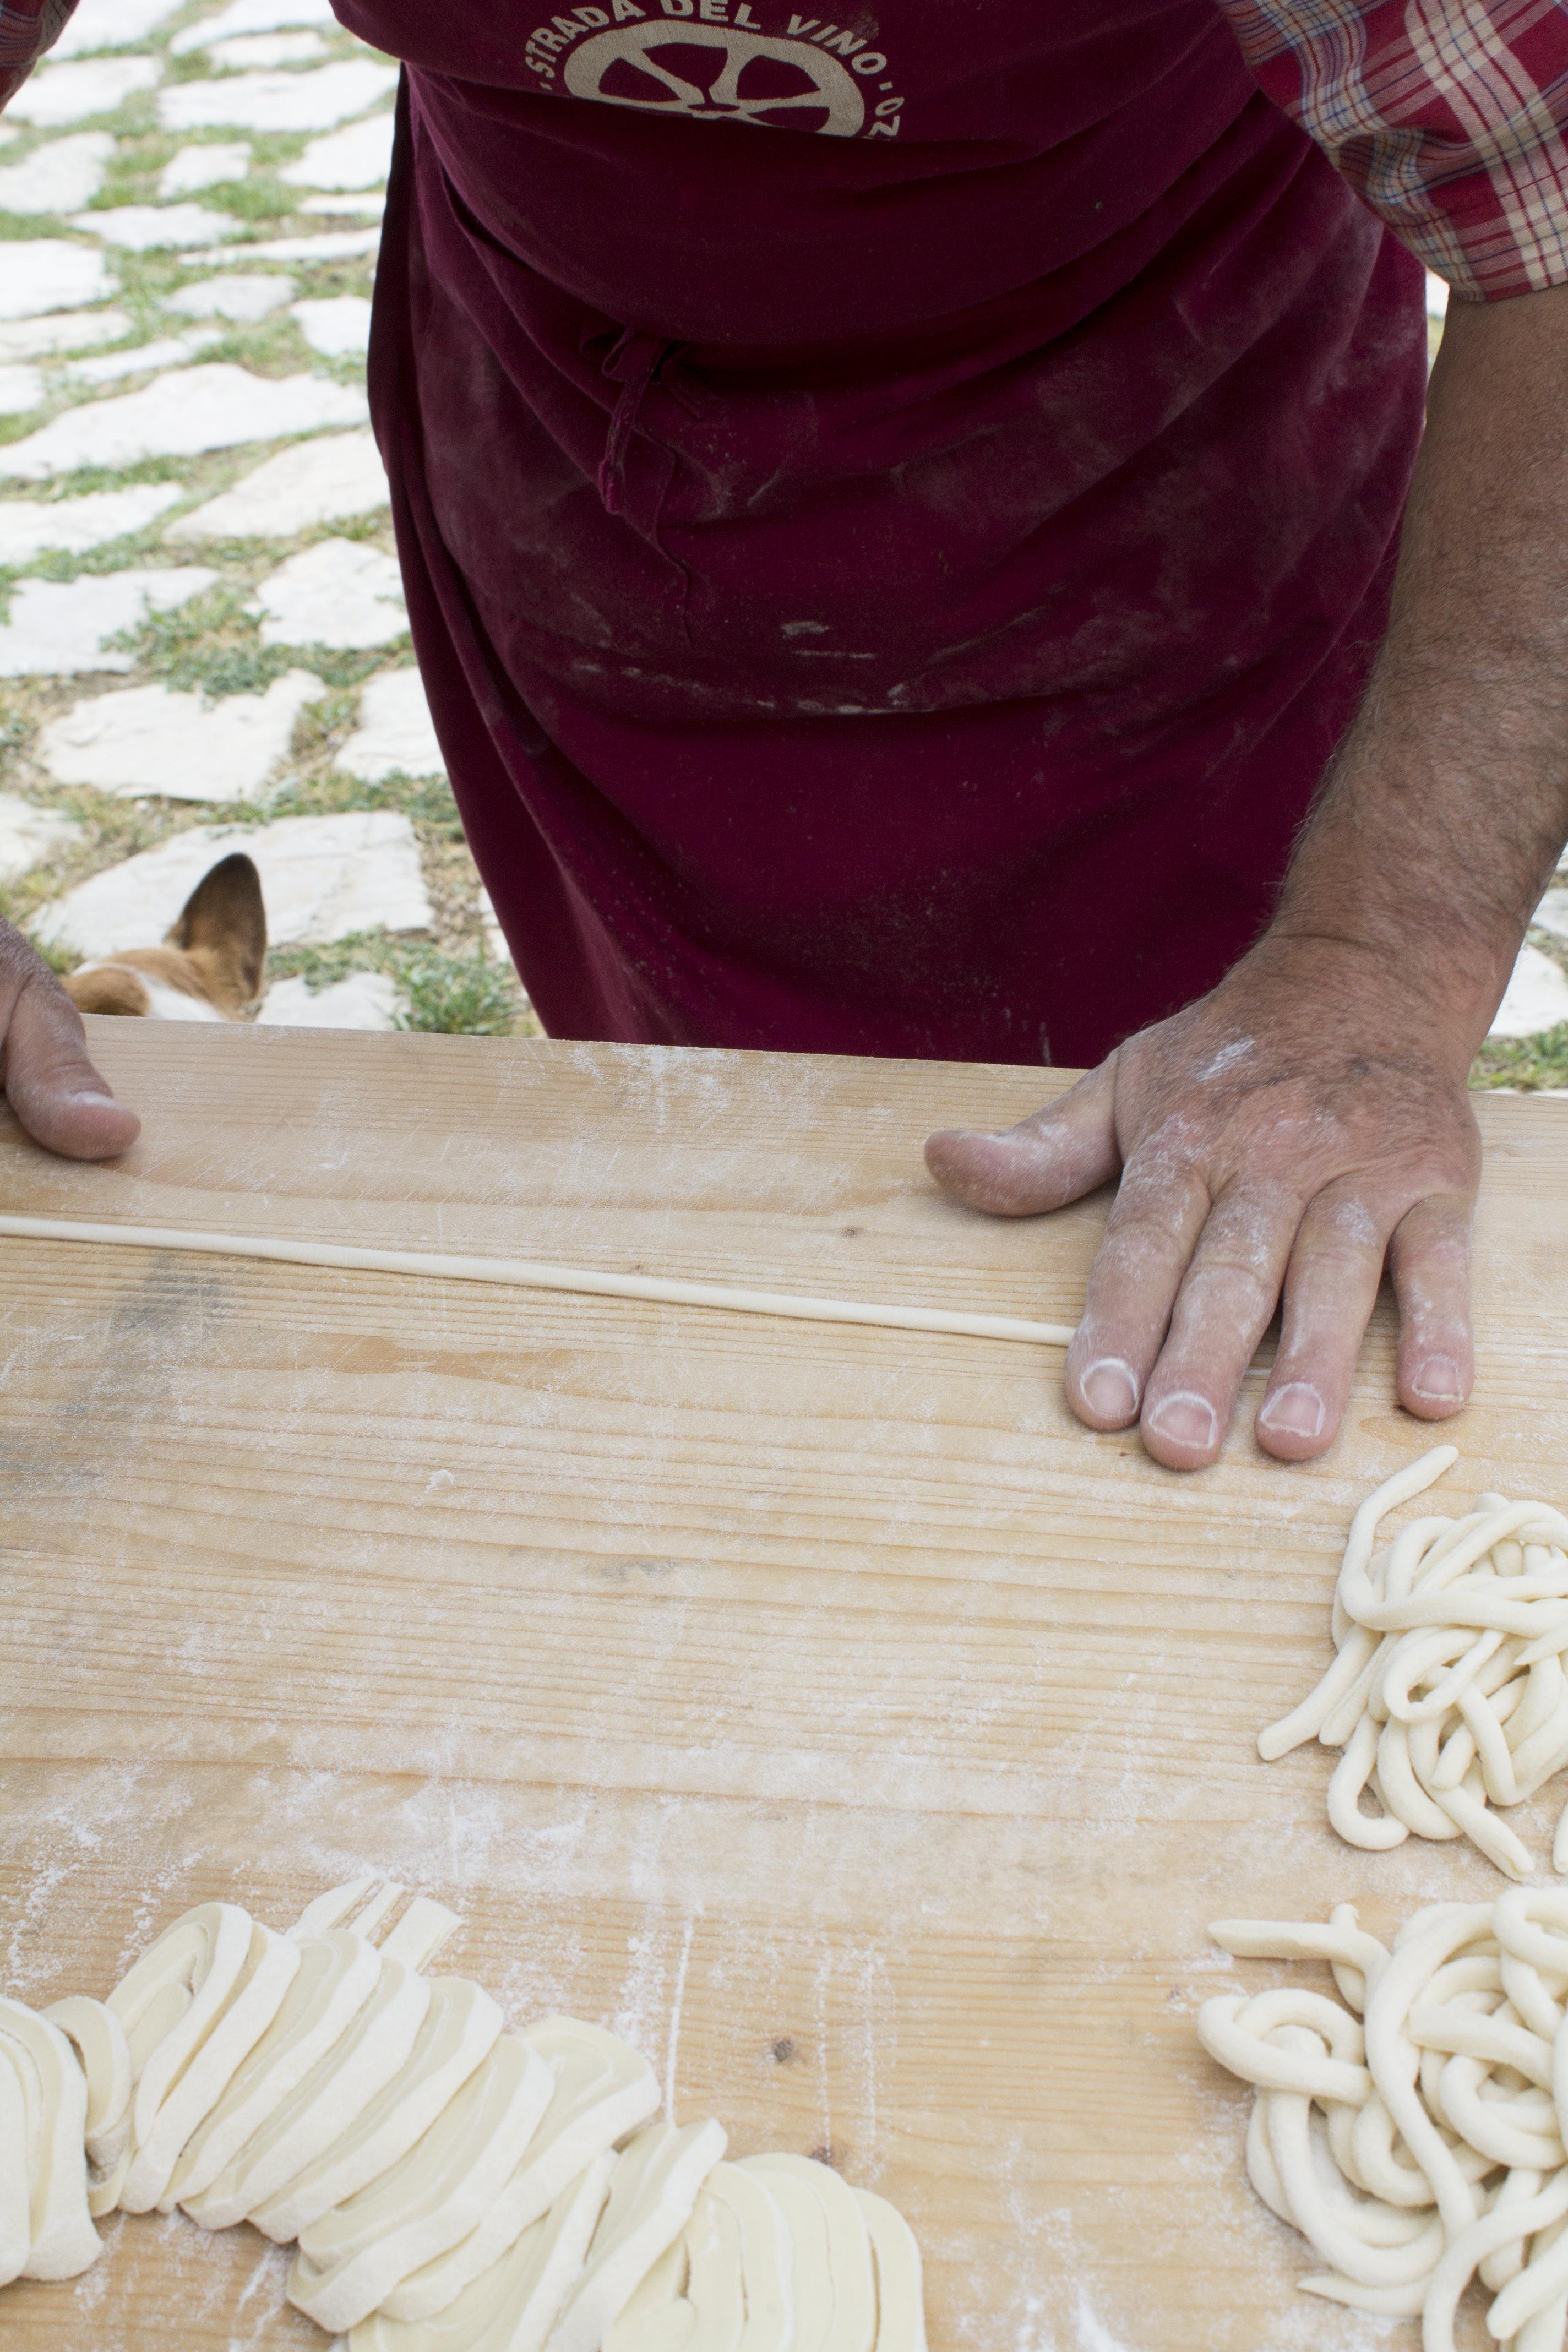 Pici-pasta-making-photo-by-Geraldine-Tan-Little-Big-Bell